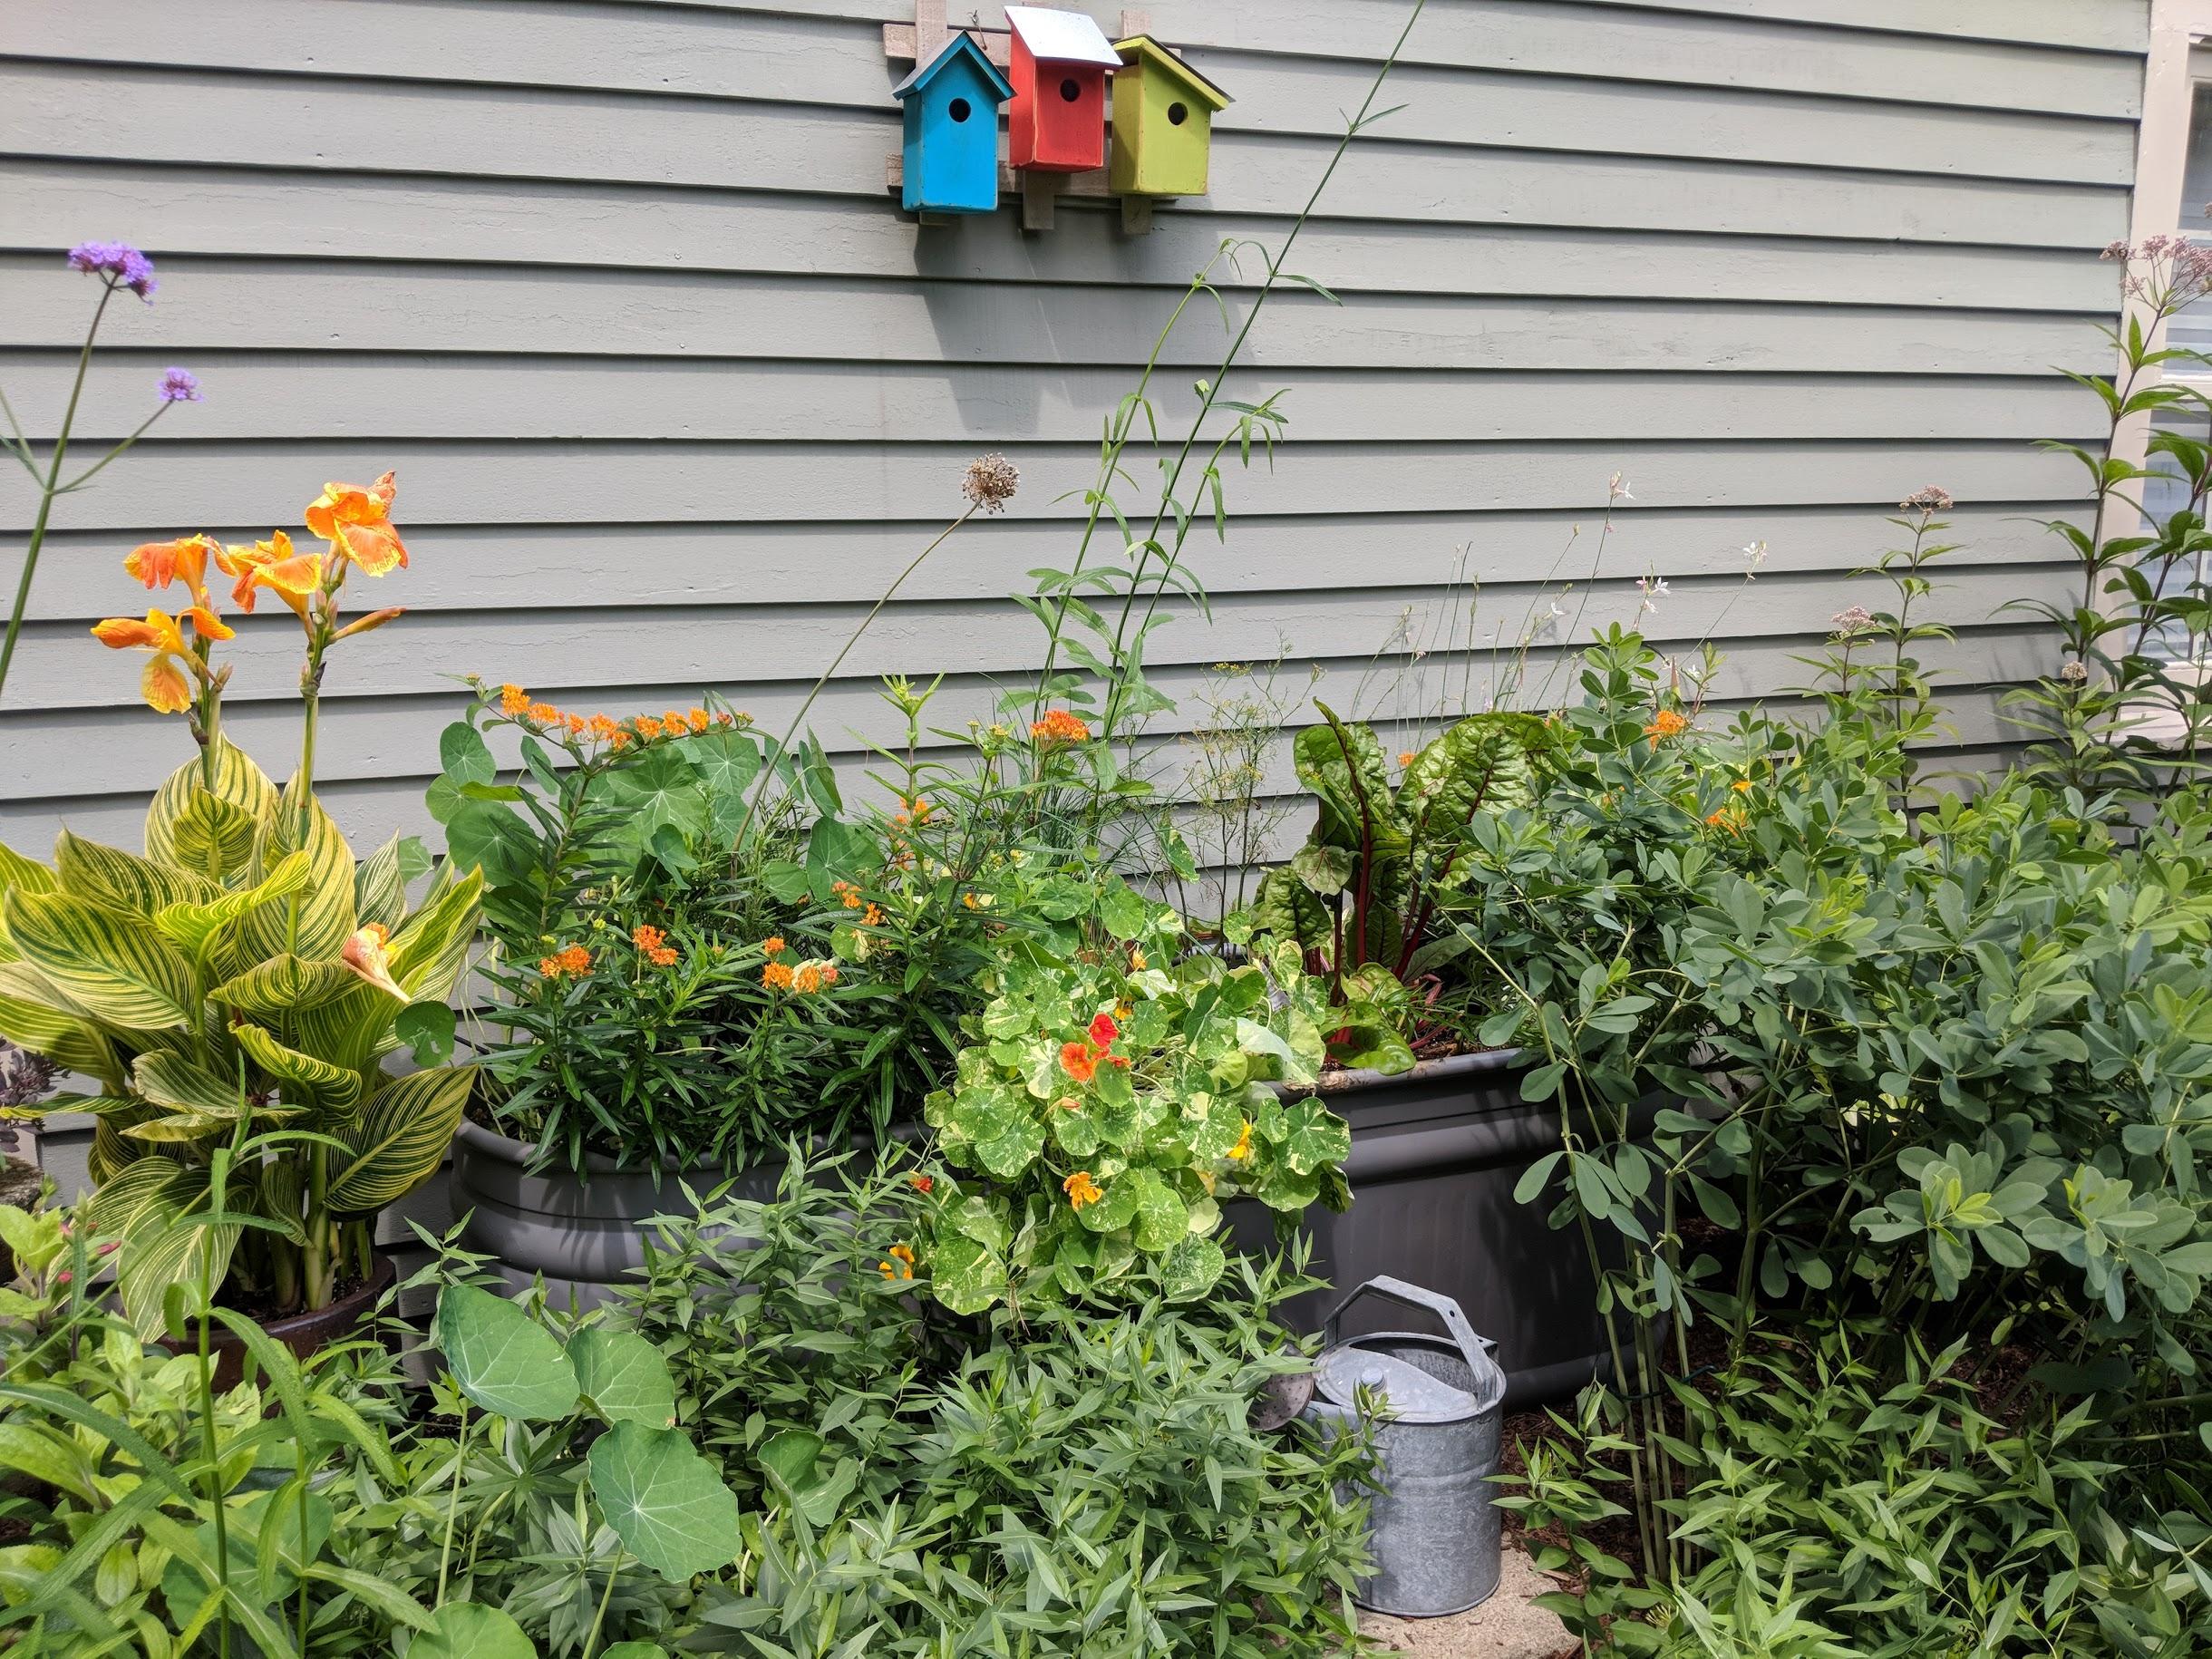 2018-07-30-horse-trough-garden.jpg